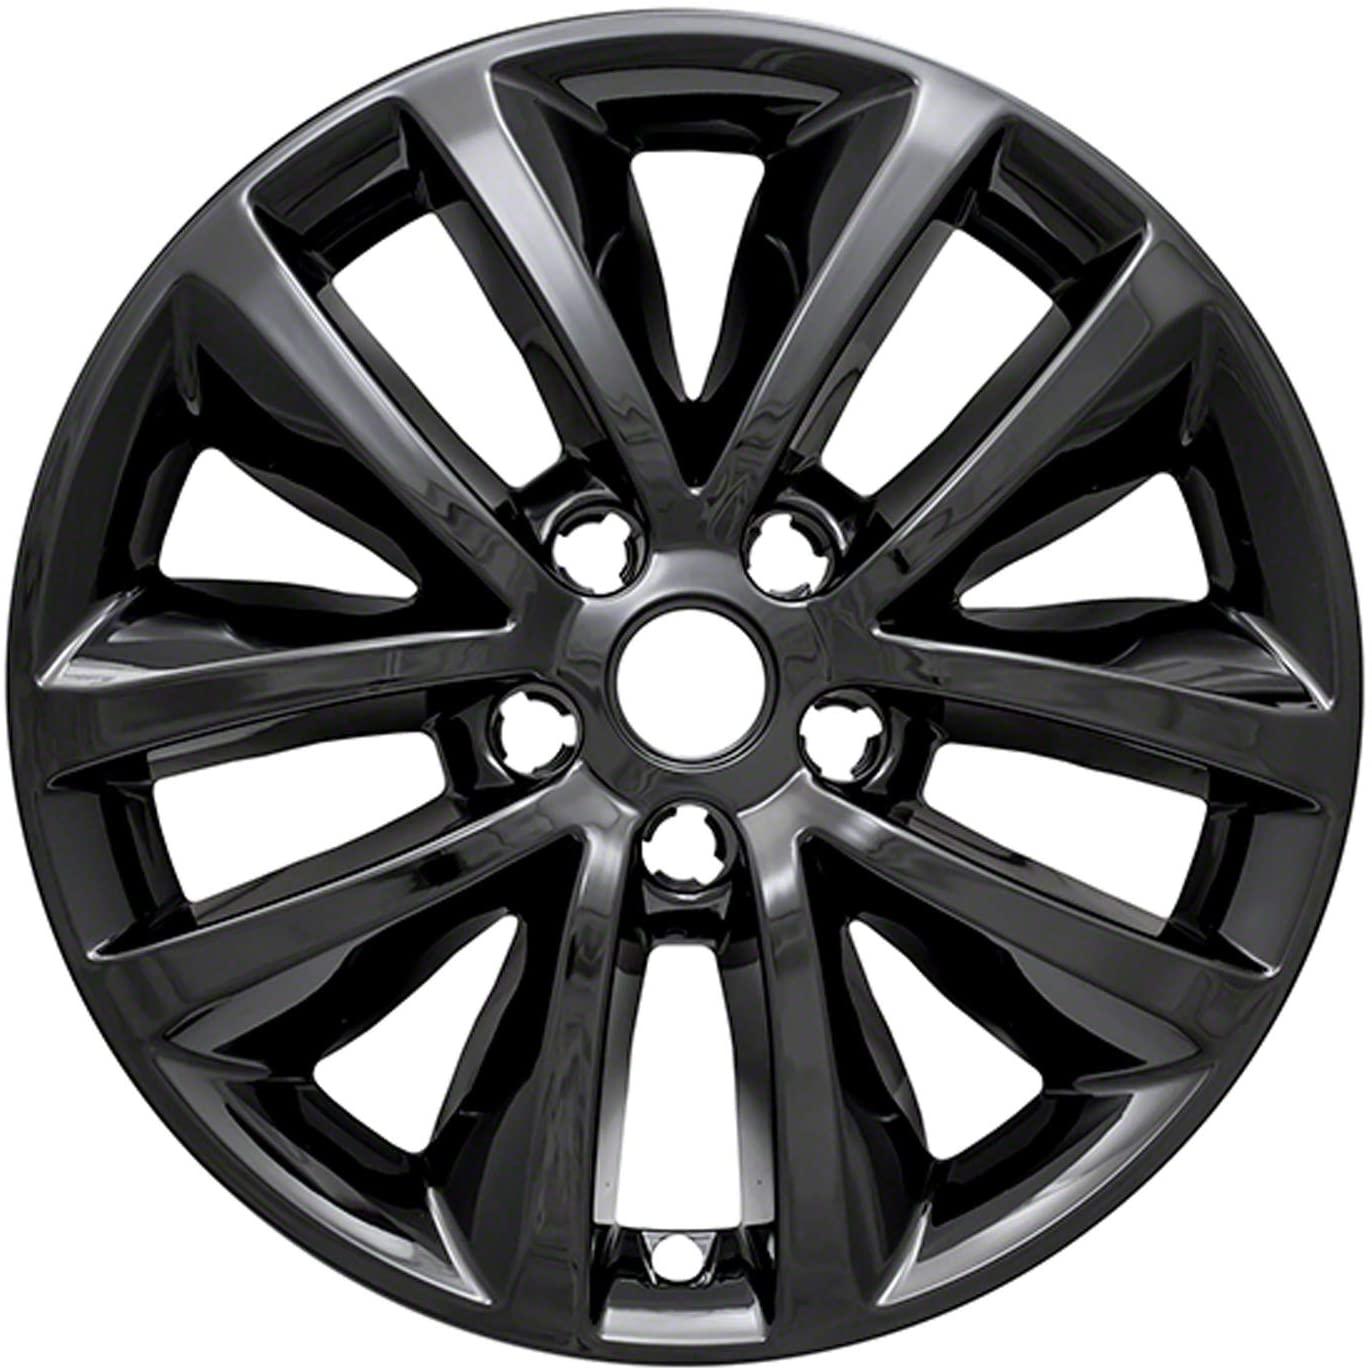 Multiple Manufactures IWCIMP399BLK Standard (No variation) Wheel Cover